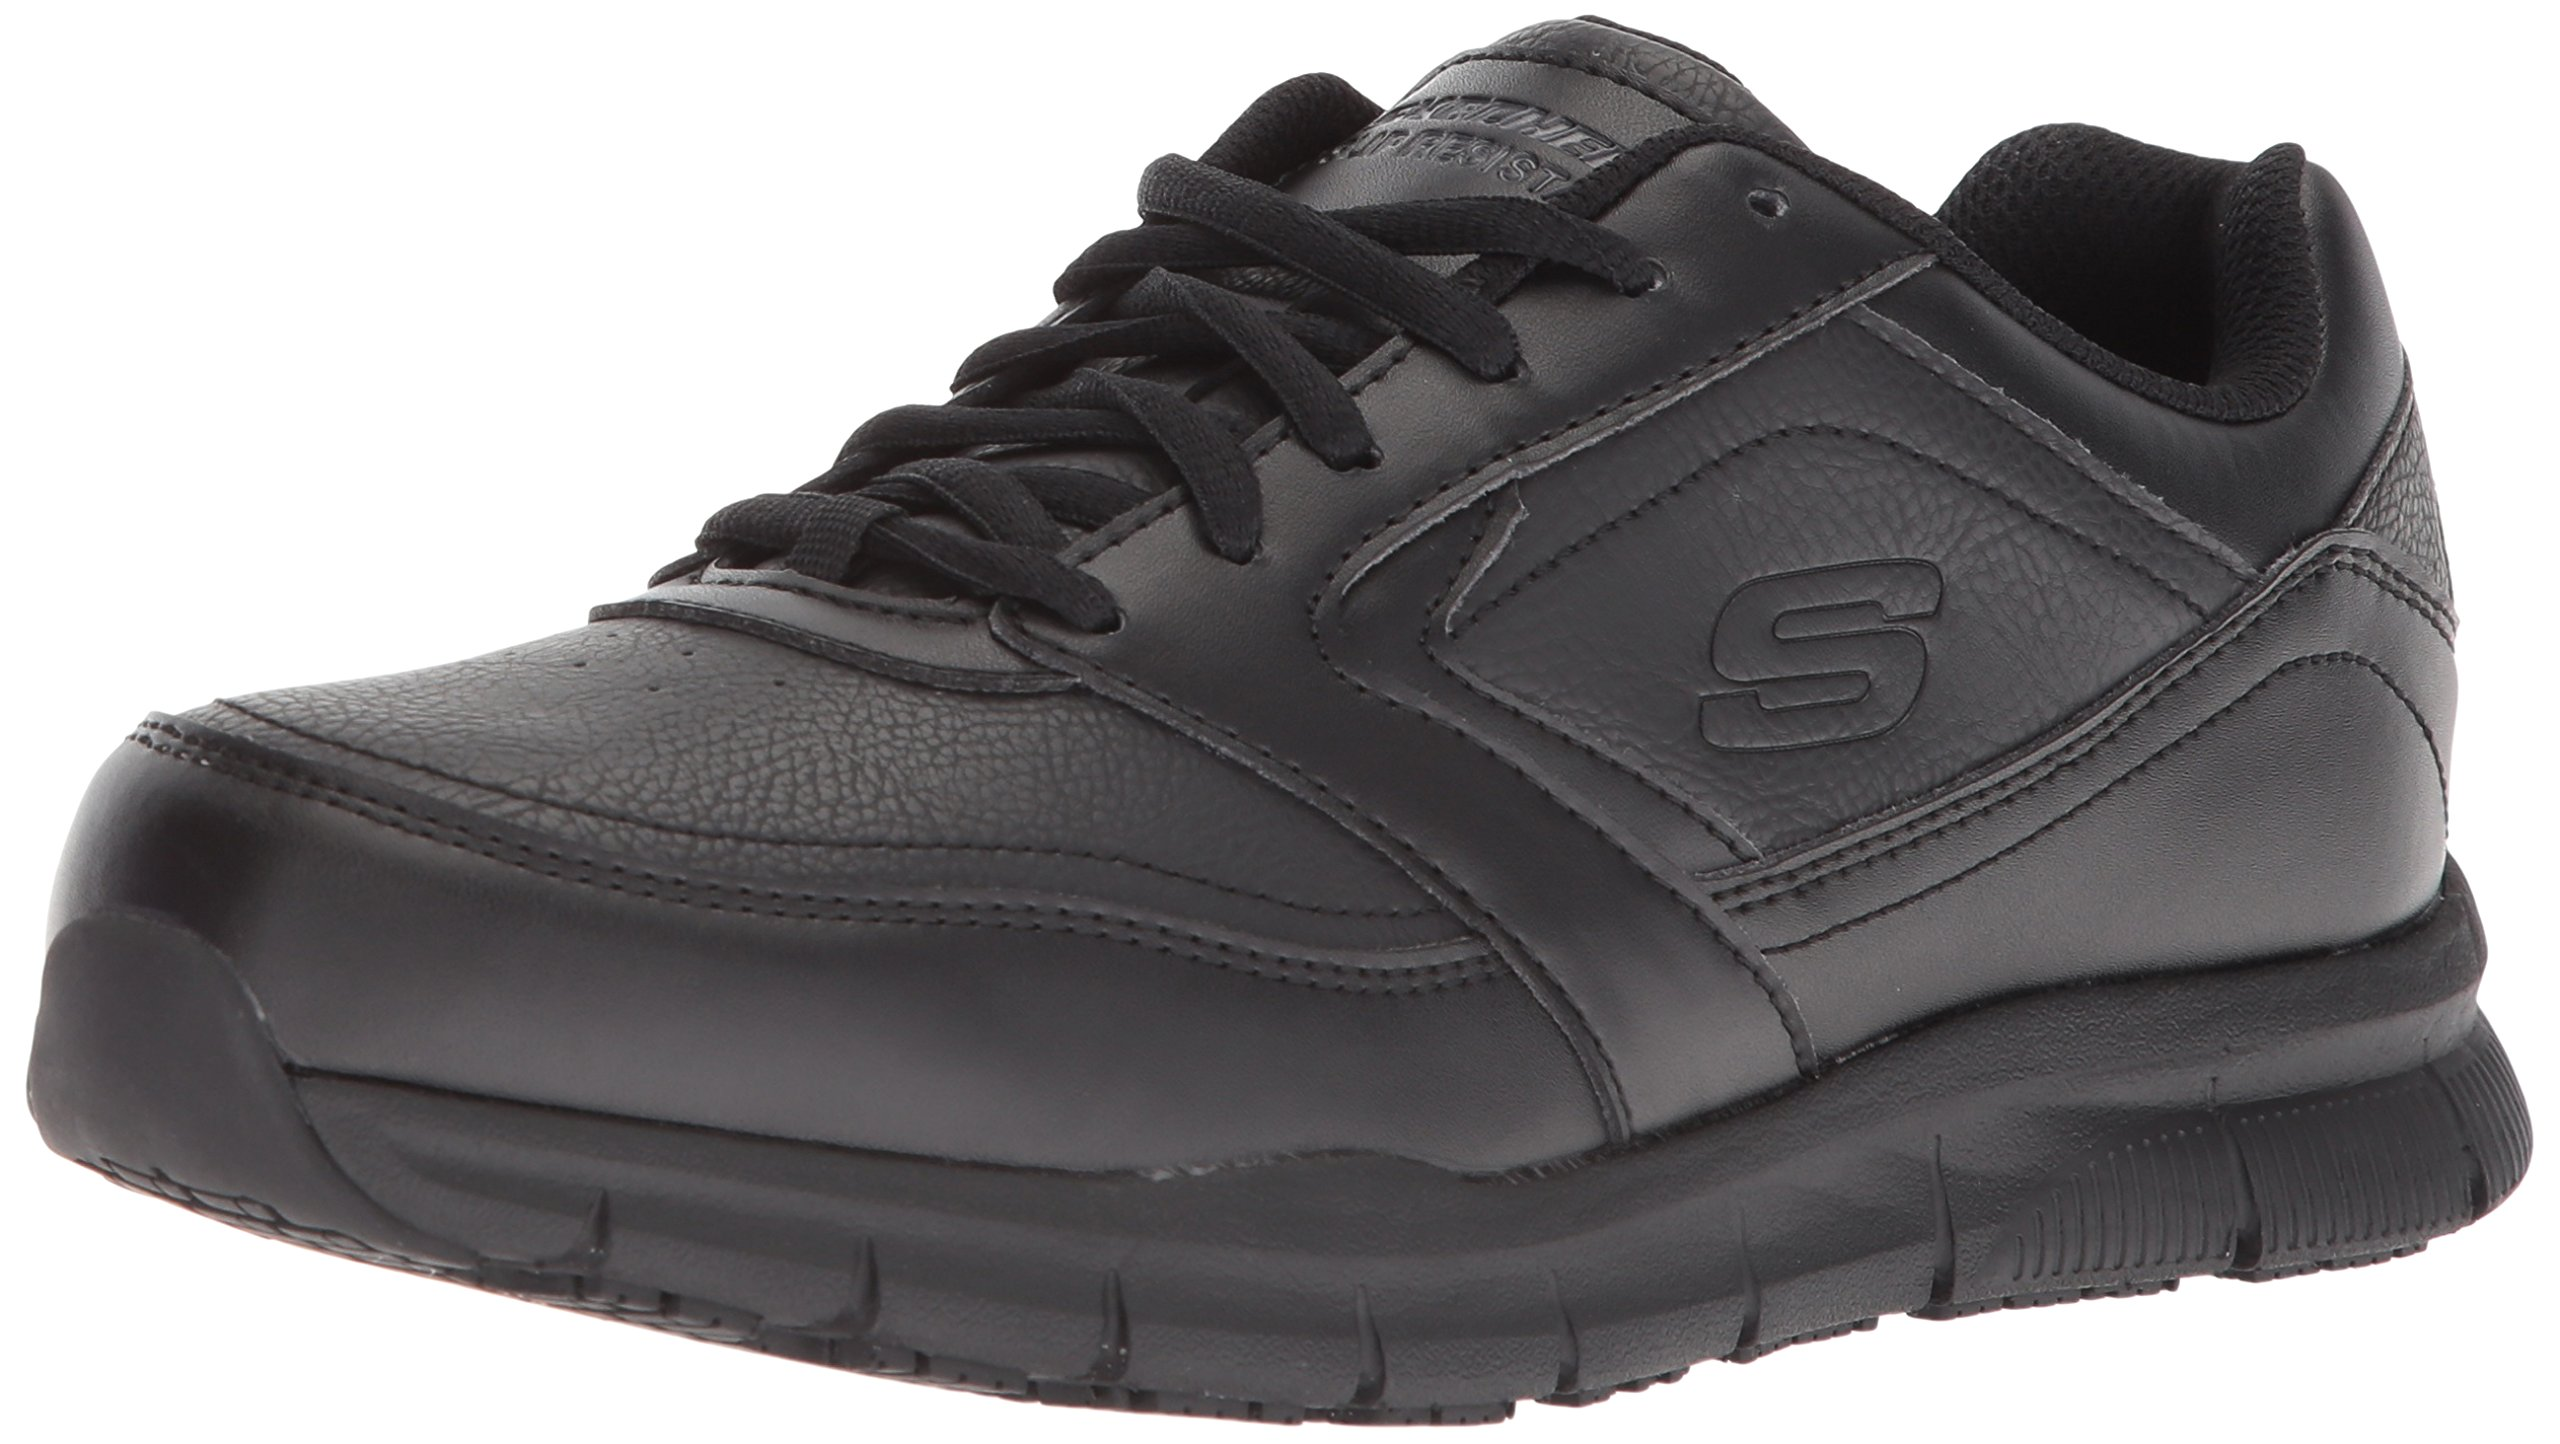 Skechers for Work Women's Nampa-Wyola Food Service Shoe, black polyurethane, 5.5 M US by Skechers